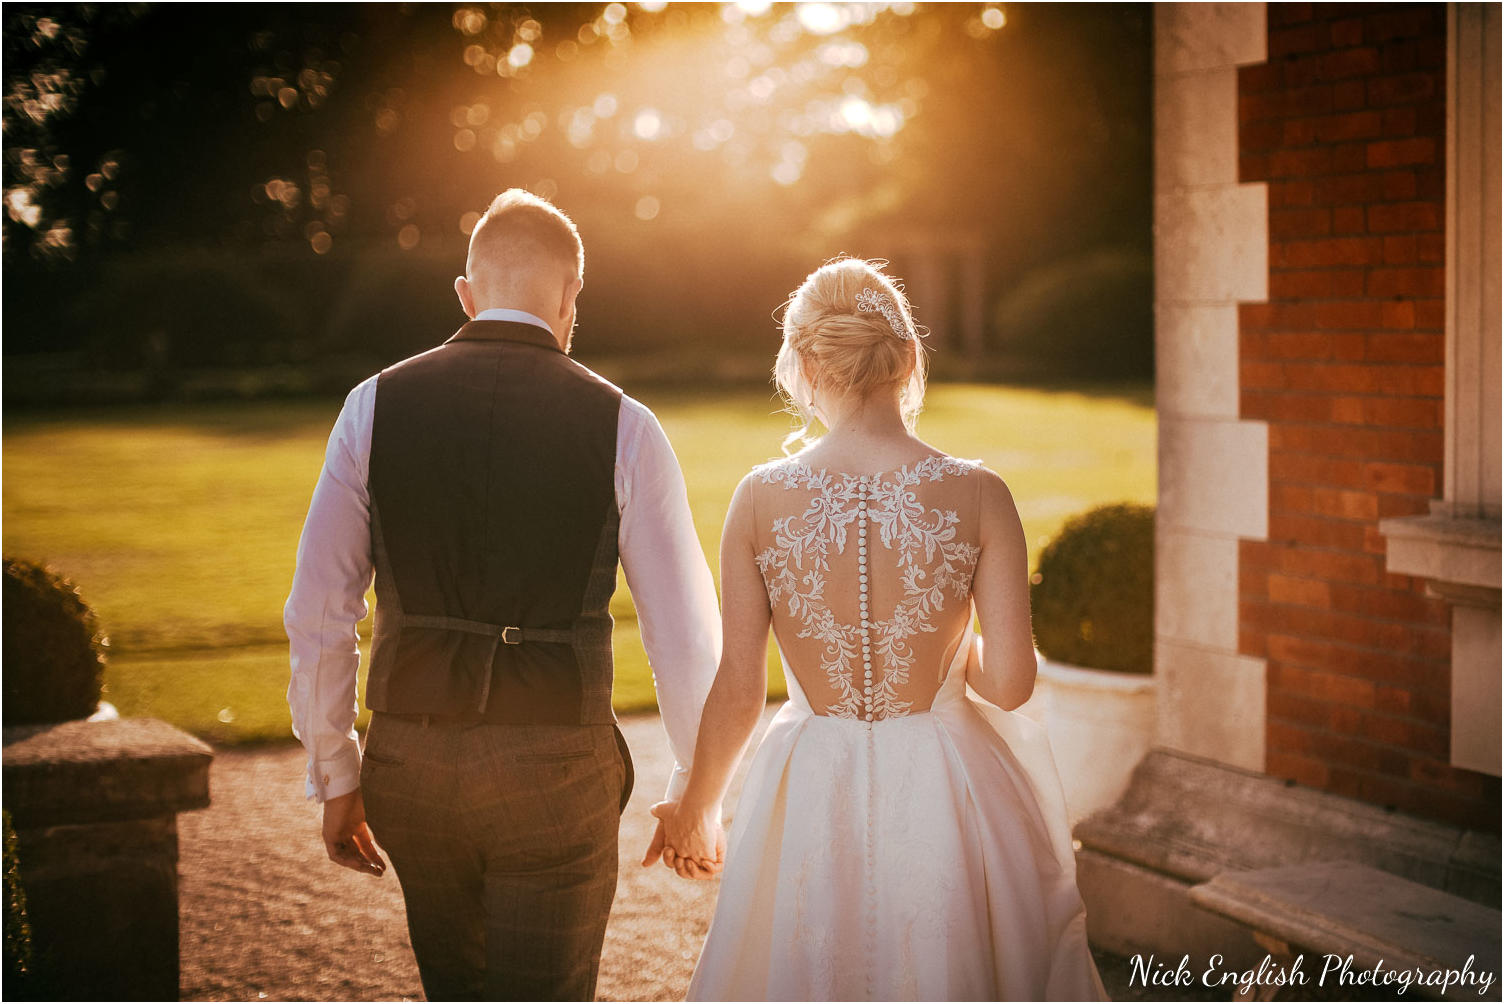 Eaves_Hall_Outdoor_Wedding_Photograph-79.jpg